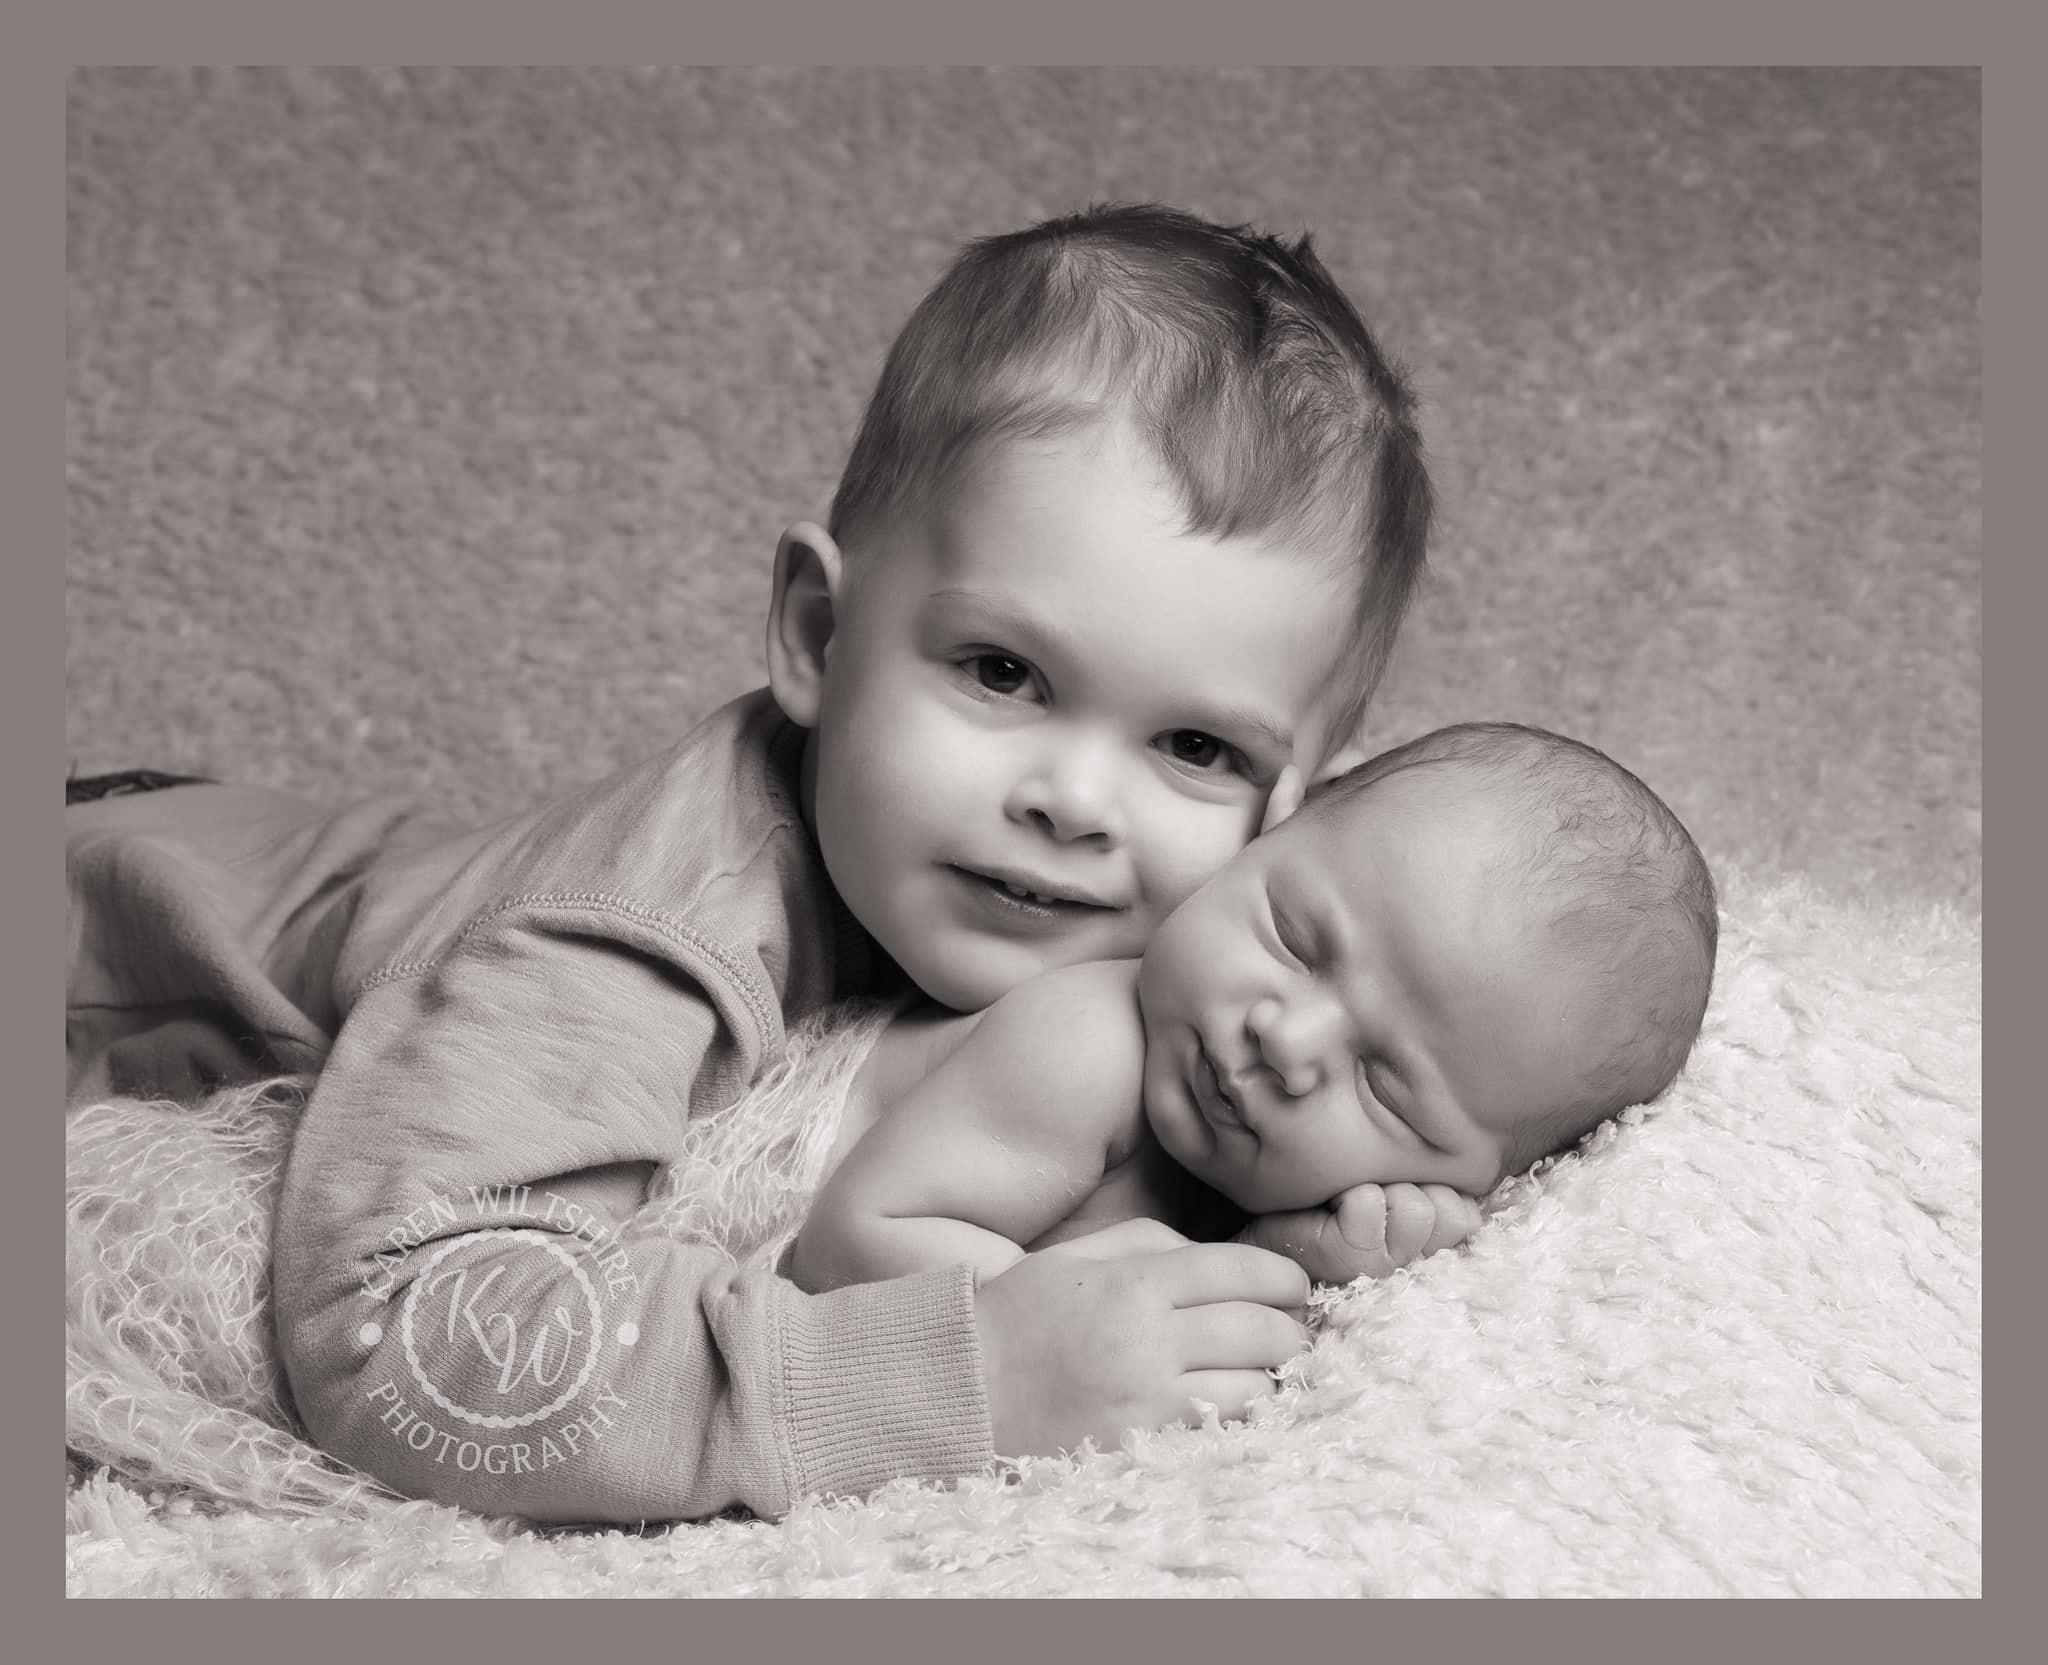 older brother cuddling his newborn baby sibling